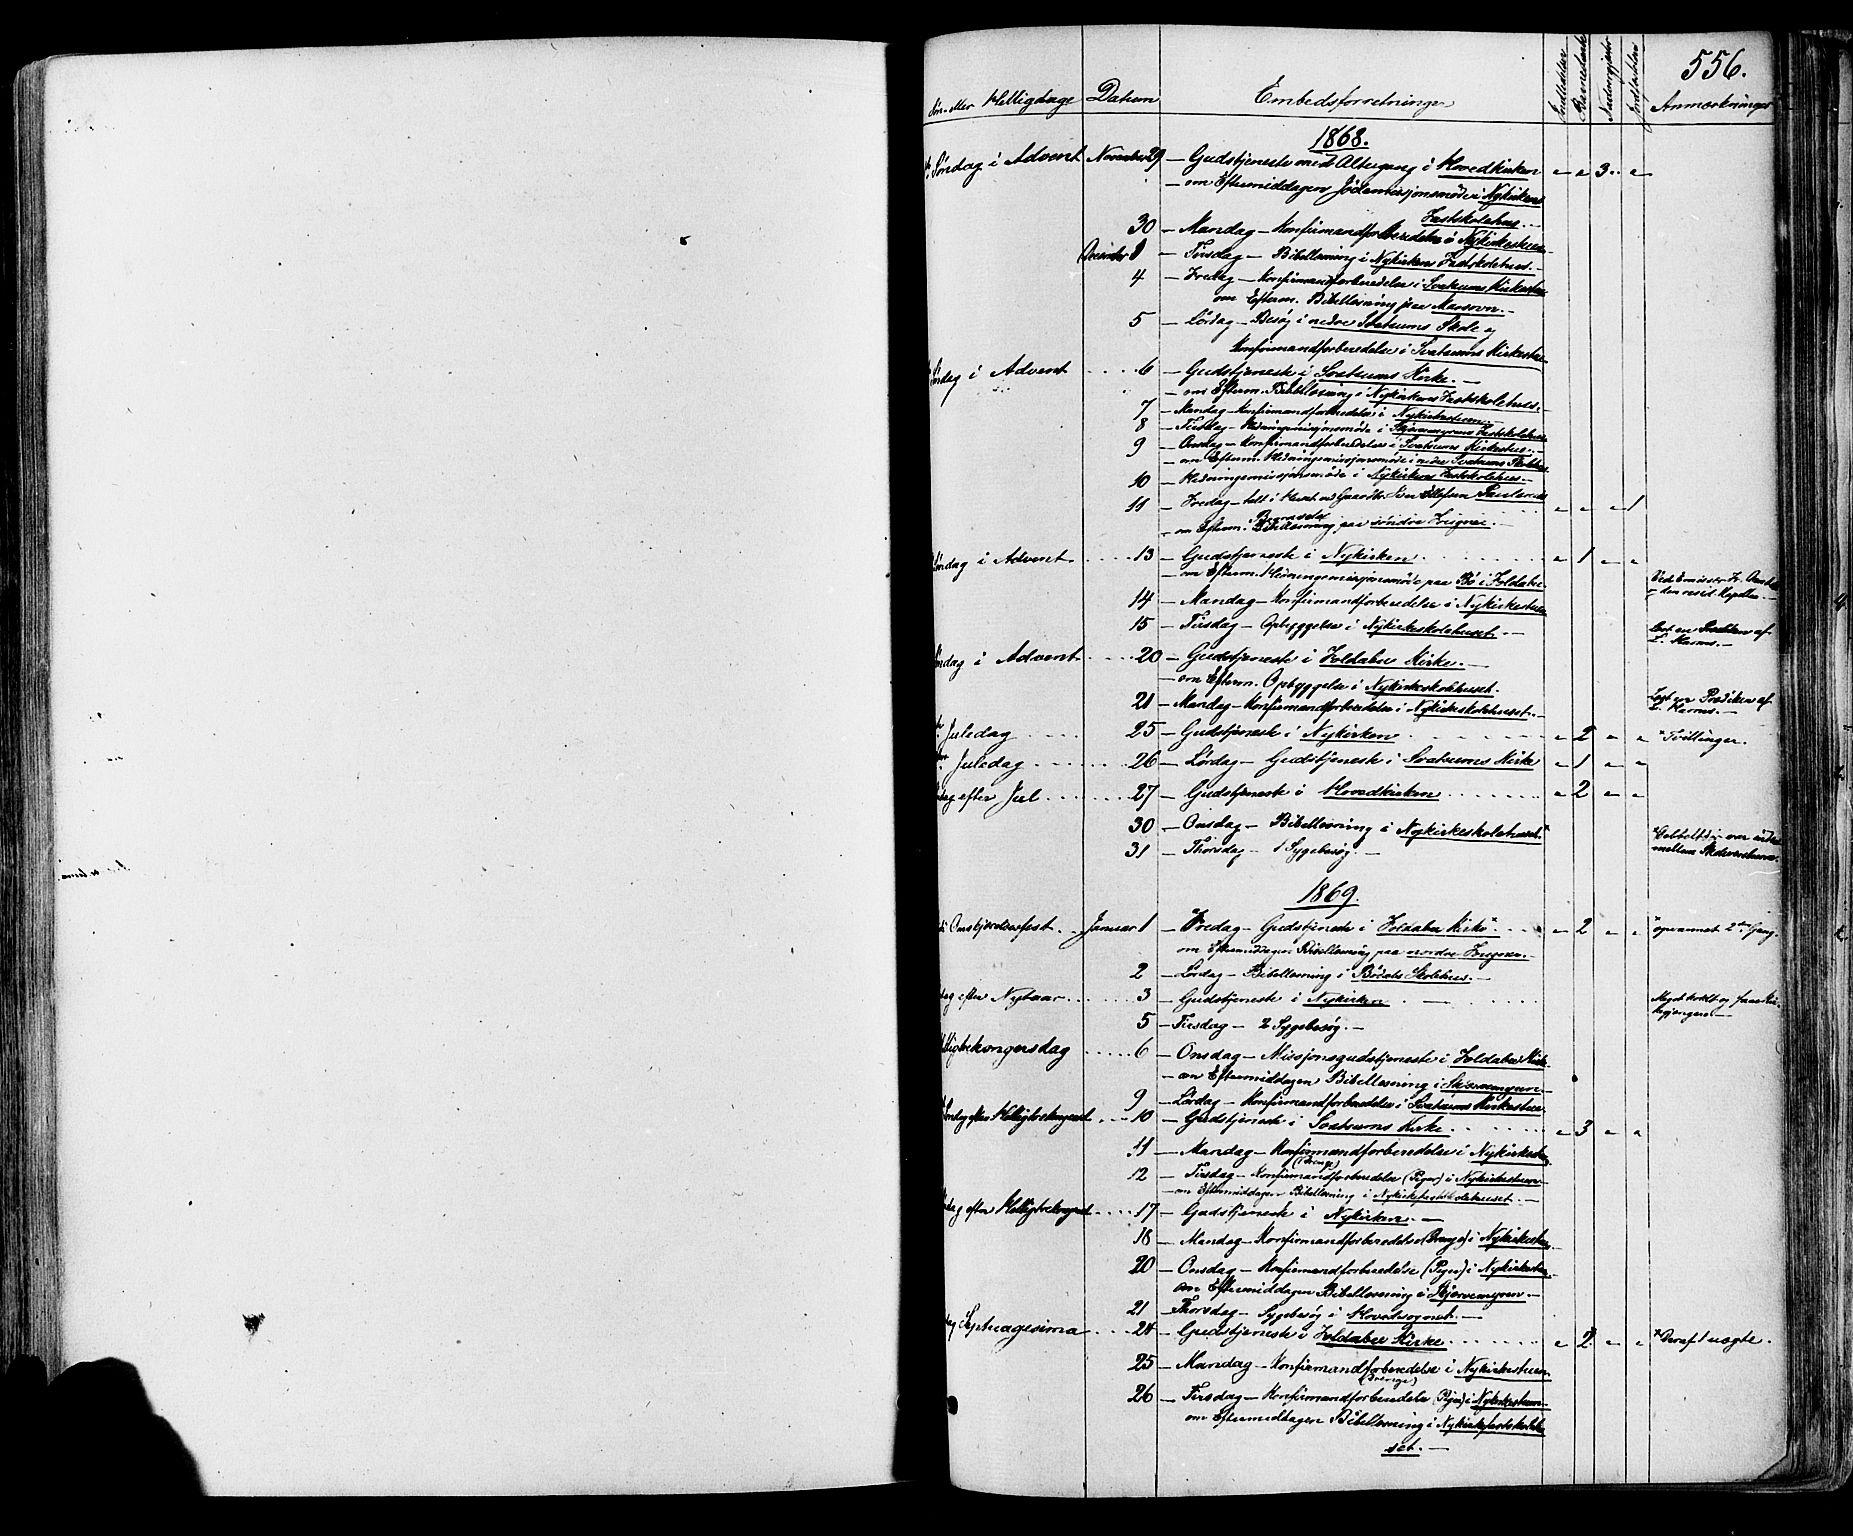 SAH, Gausdal prestekontor, Ministerialbok nr. 10, 1867-1886, s. 556